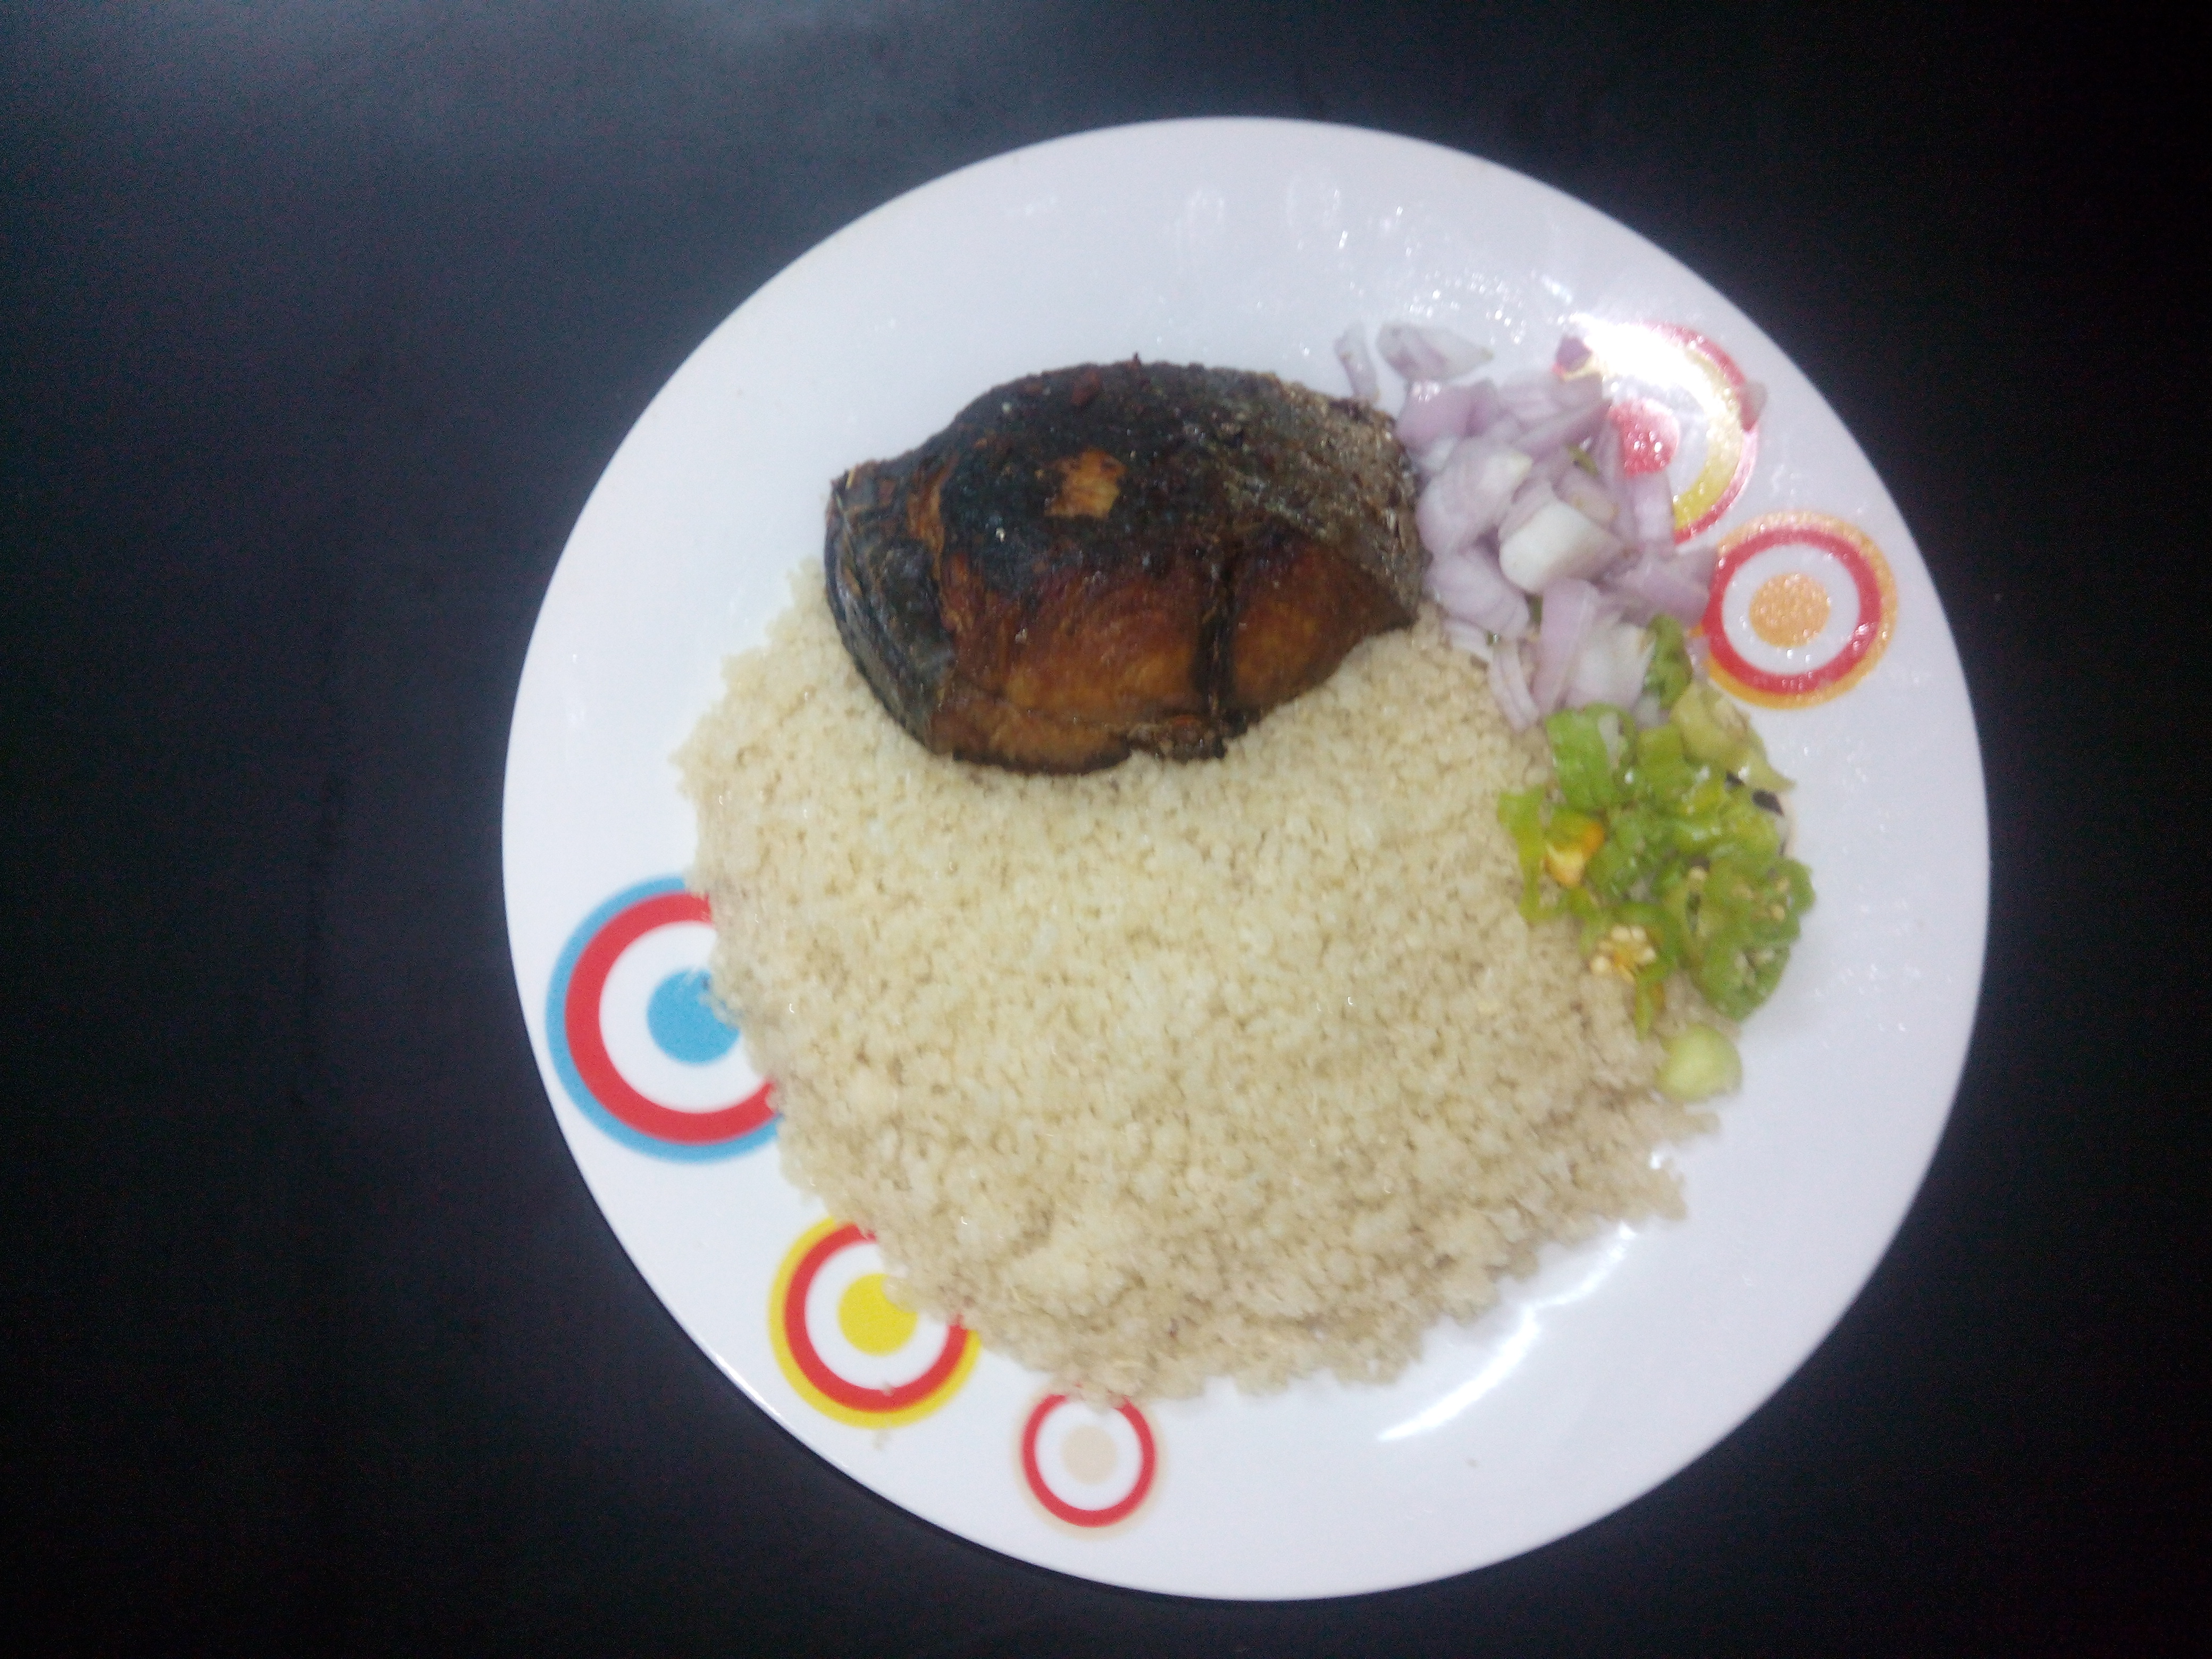 Image De Plat De Cuisine file:un plat de garba 1 - wikimedia commons